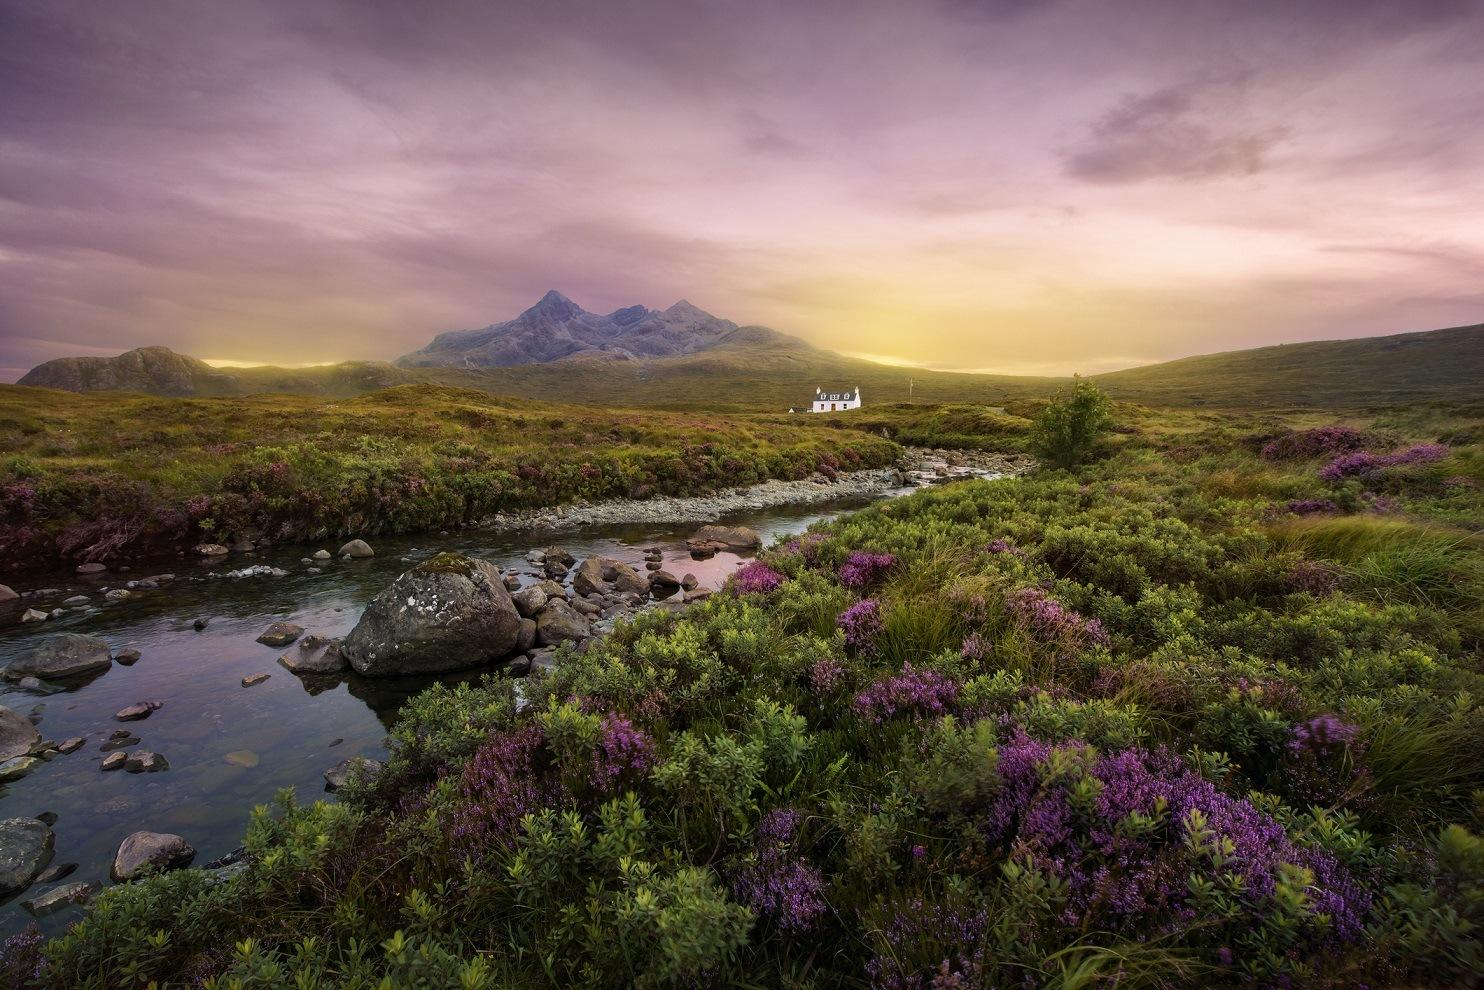 Sligchan river Scotland